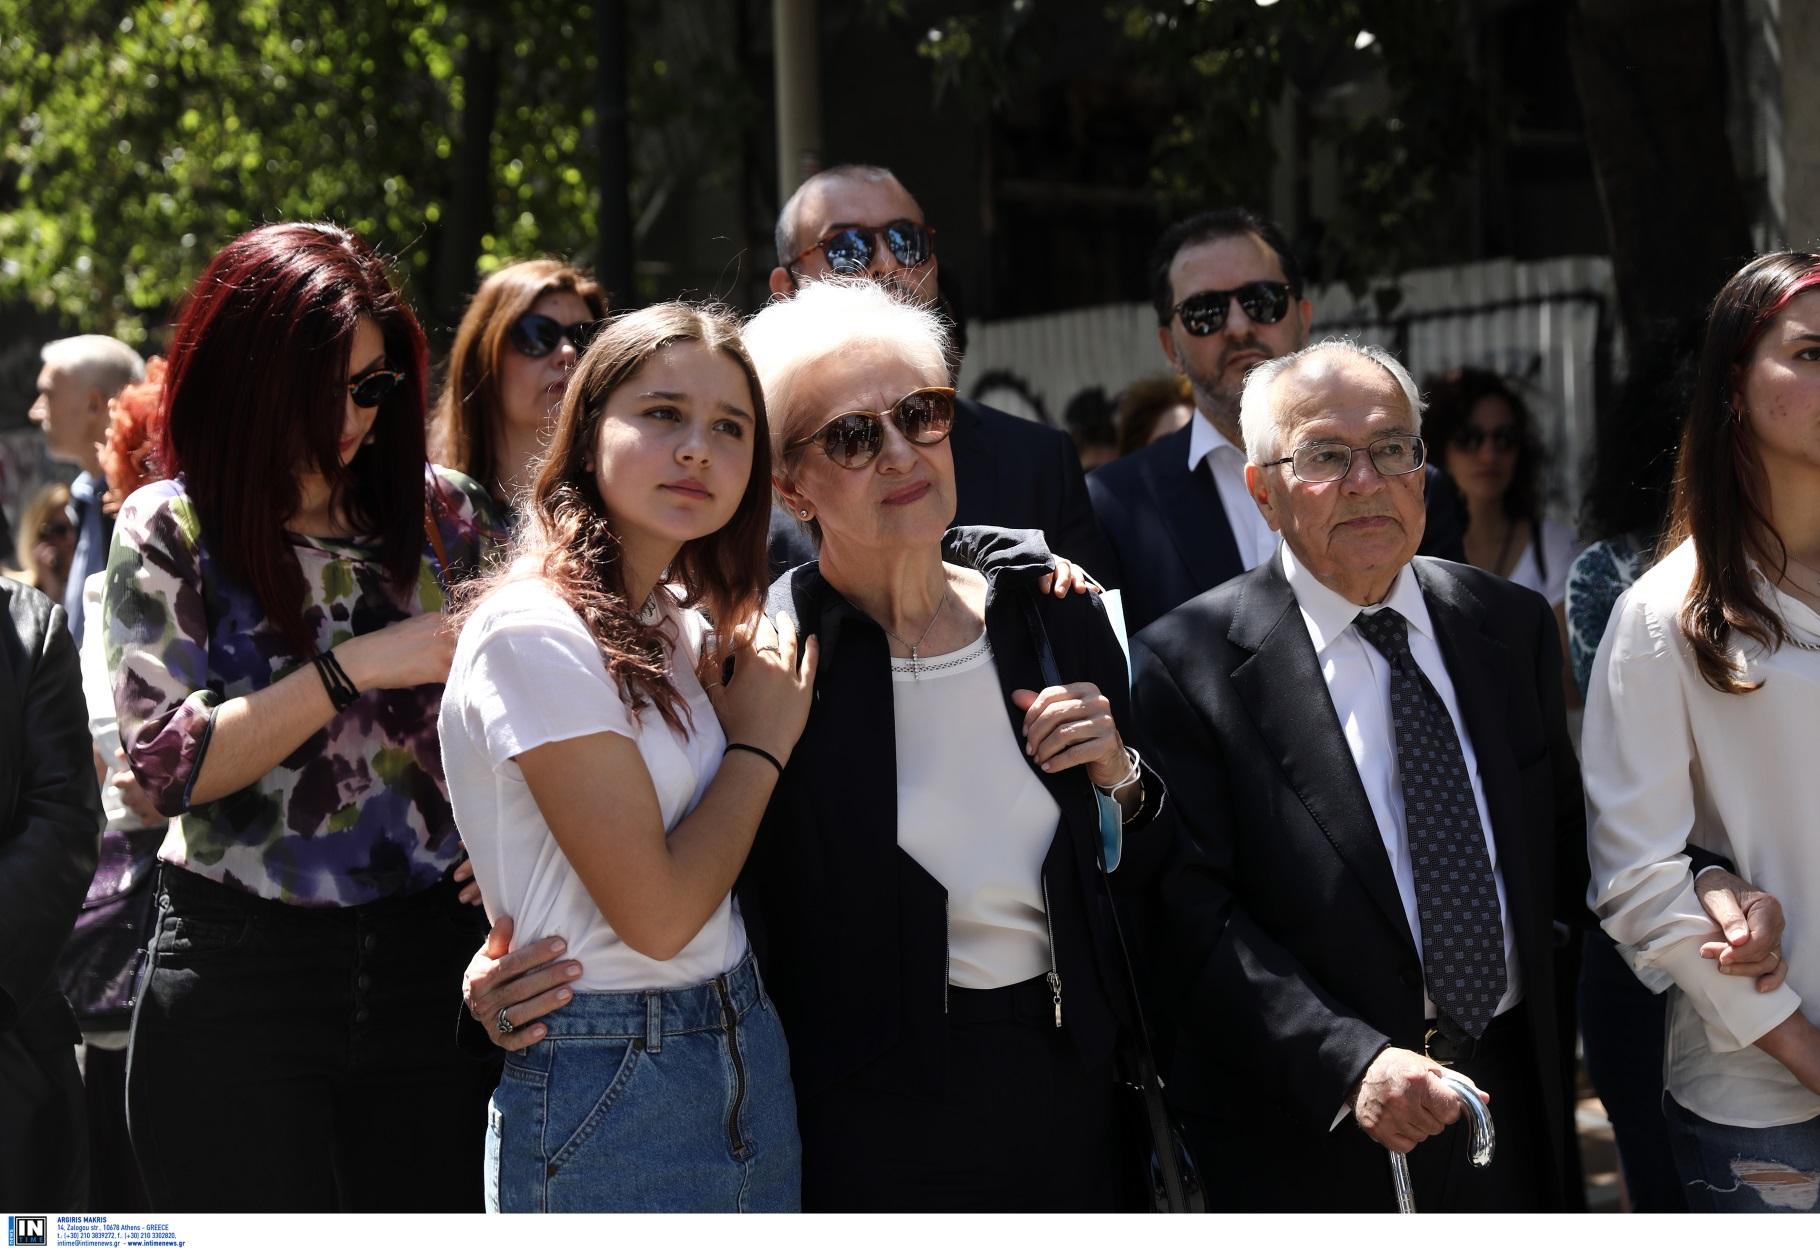 Marfin: Στιγμές συγκίνησης των οικογενειών στην εκδήλωση μνήμης για τα θύματα (pics)